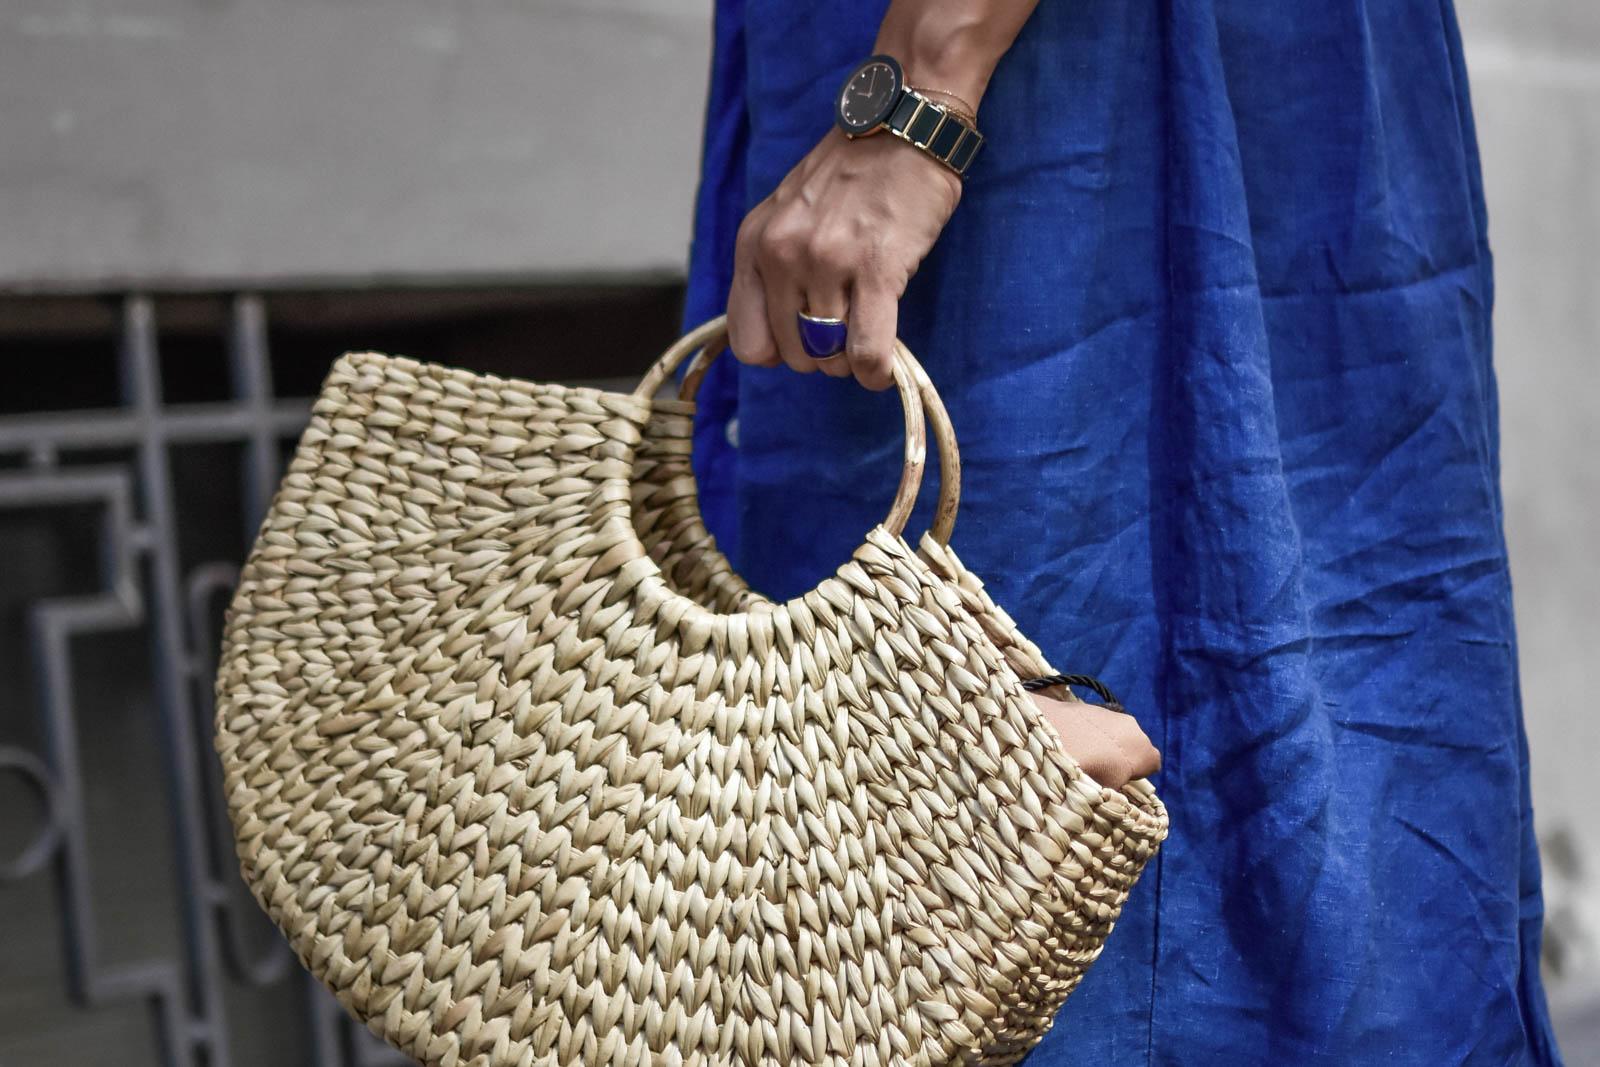 el-blog-de-silvia-rodriguez-Streetstyle-vestido-camisero-azul-lino-zara-sandalias-lazo-blog-de-moda-Influencer